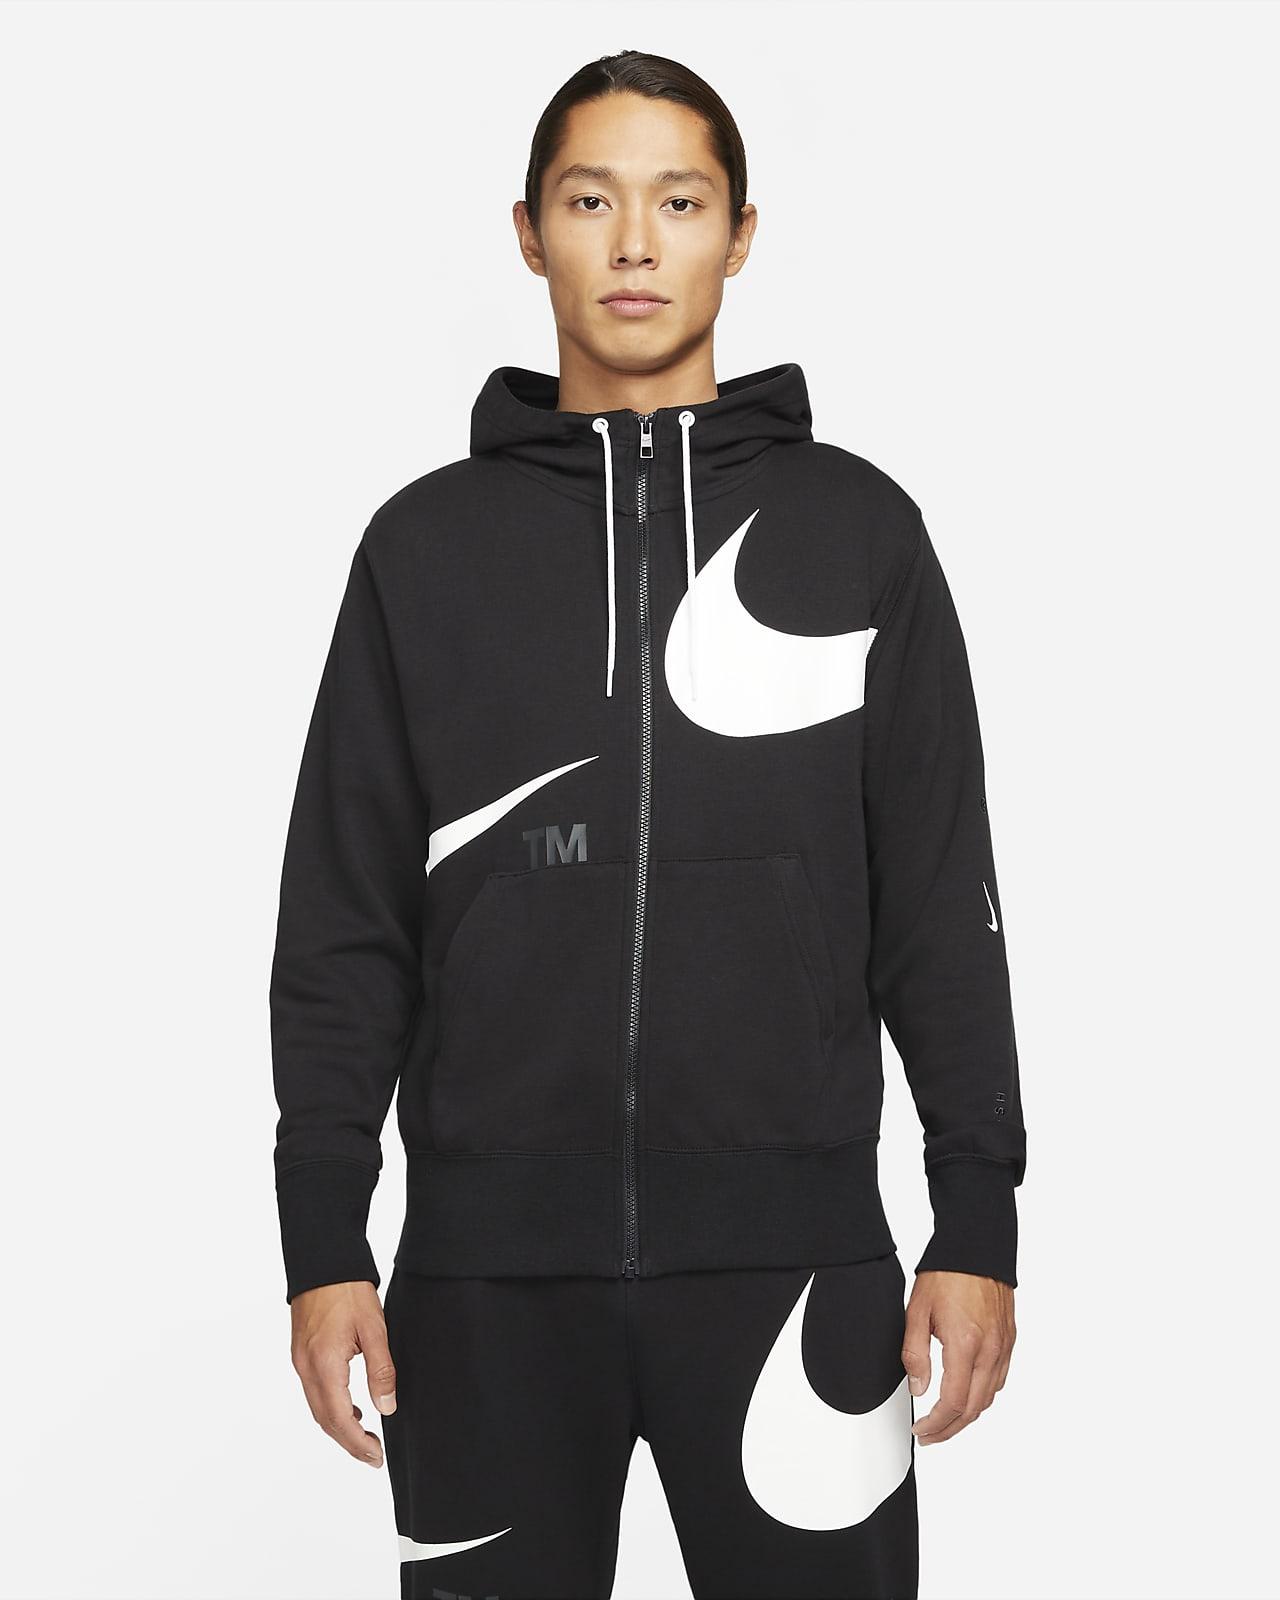 Nike Sportswear Swoosh Men's Full-Zip French Terry Hoodie